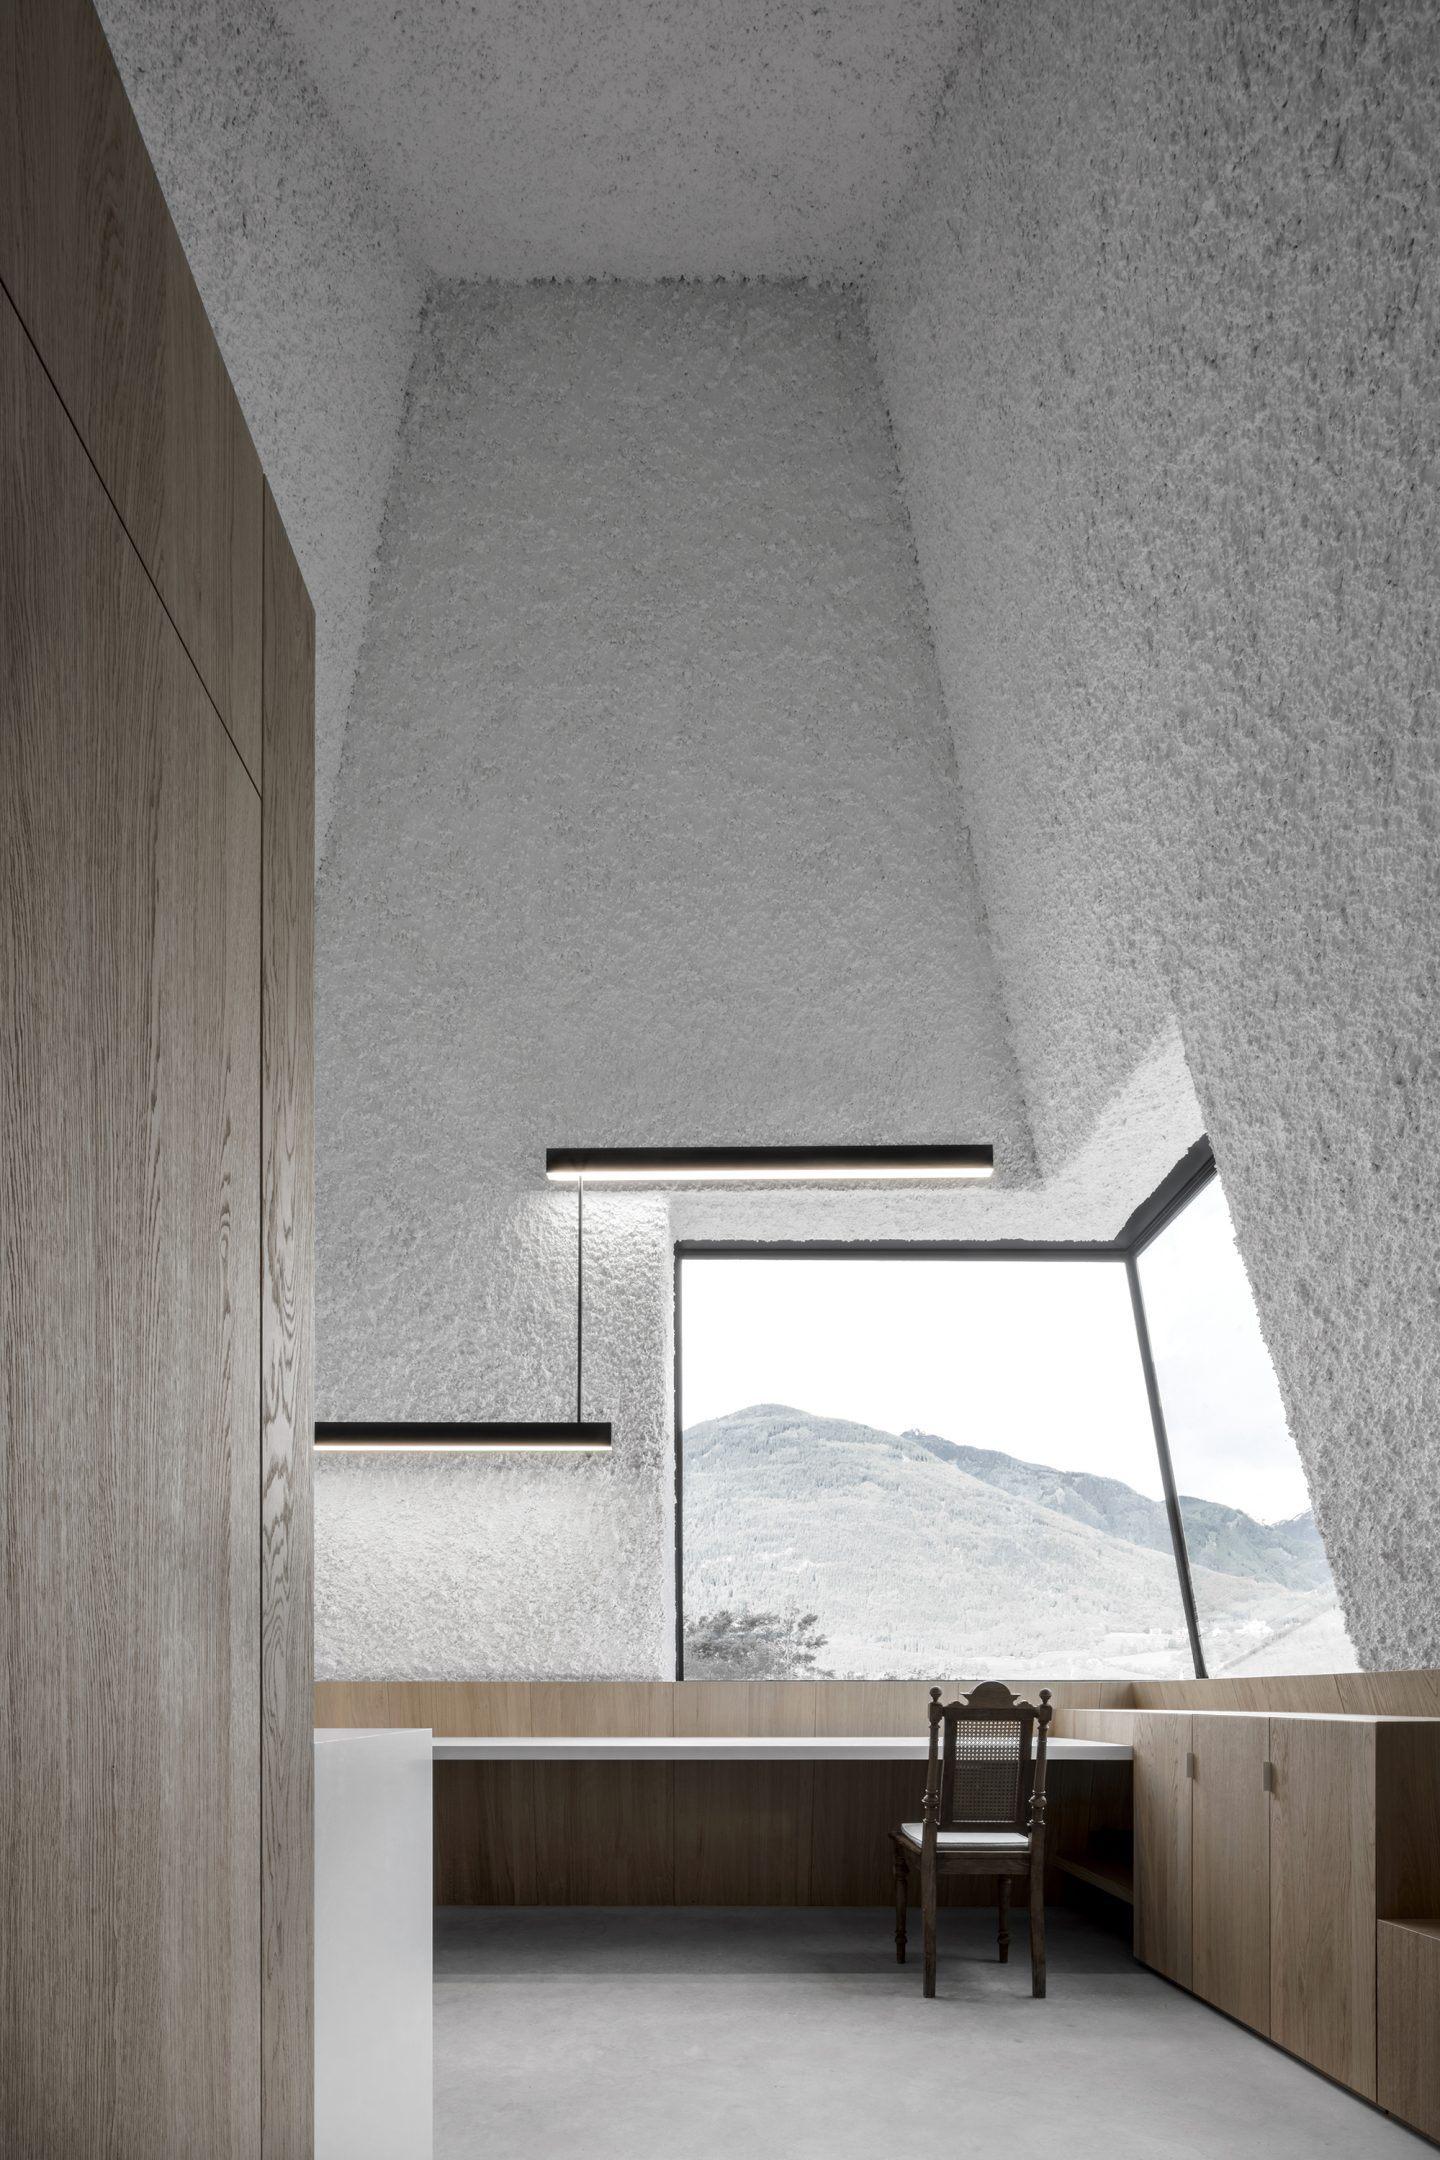 IGNANT-Architecture-Bergmeisterwolf-Neue-Keller-6